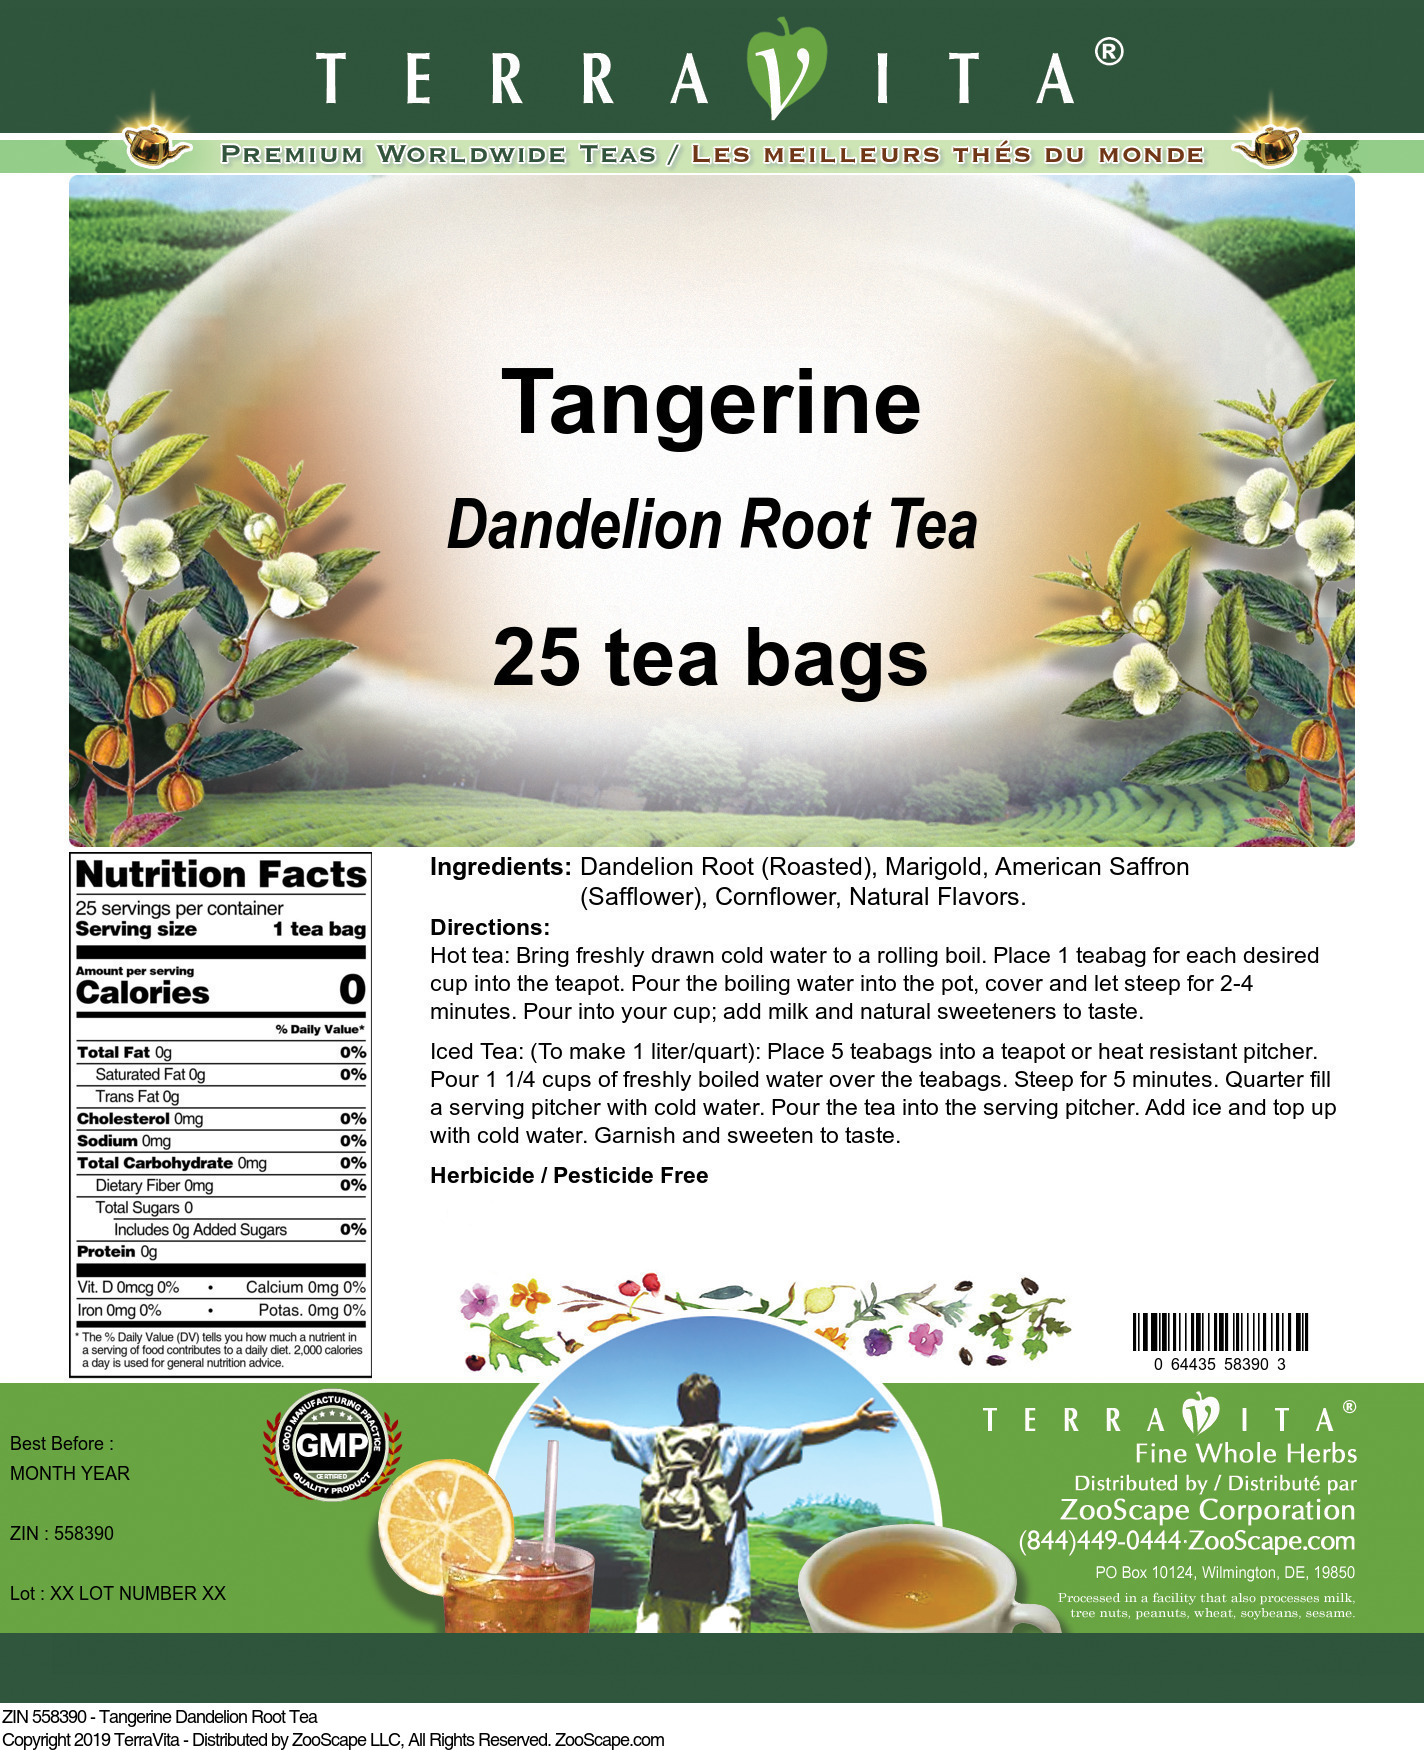 Tangerine Dandelion Root